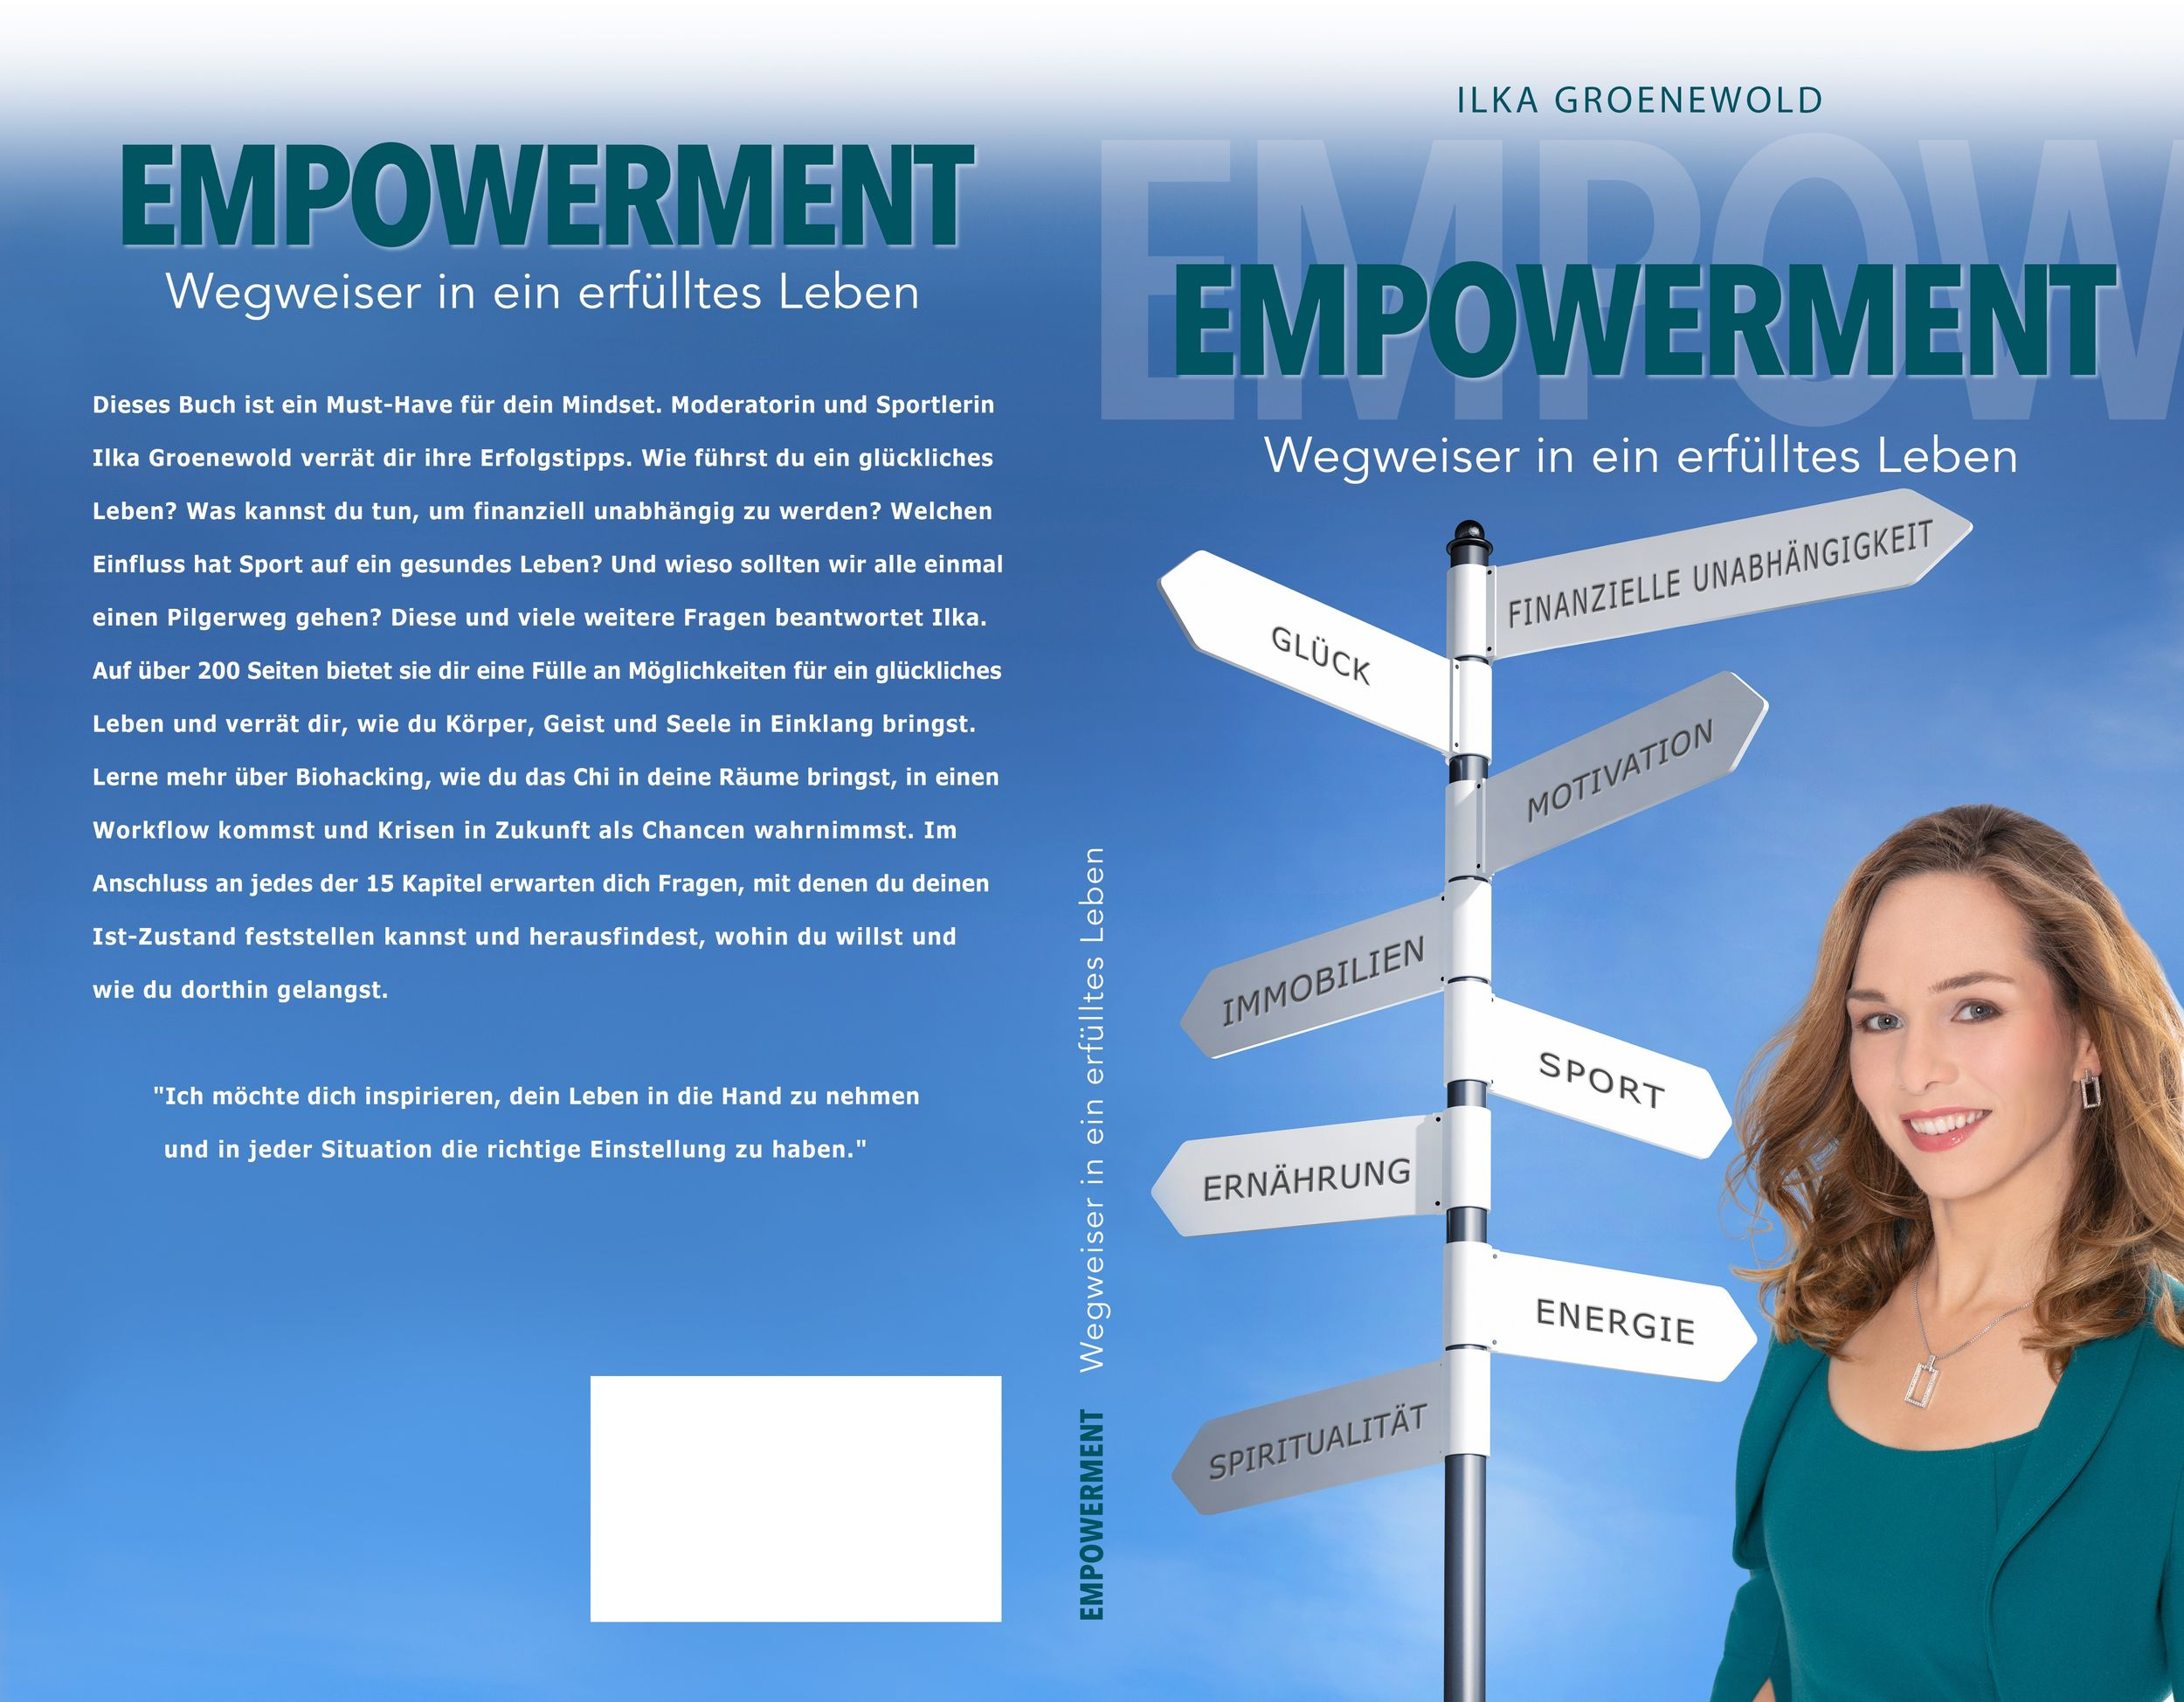 Ilka Groenewold | Empowerment – Wegweiser in ein erfülltes Leben Buch | ISBN 979-8-66556-479-1 | 19,95 Euro Kindle eBook | ASIN B08GJBY3SZ | 9,99 Euro